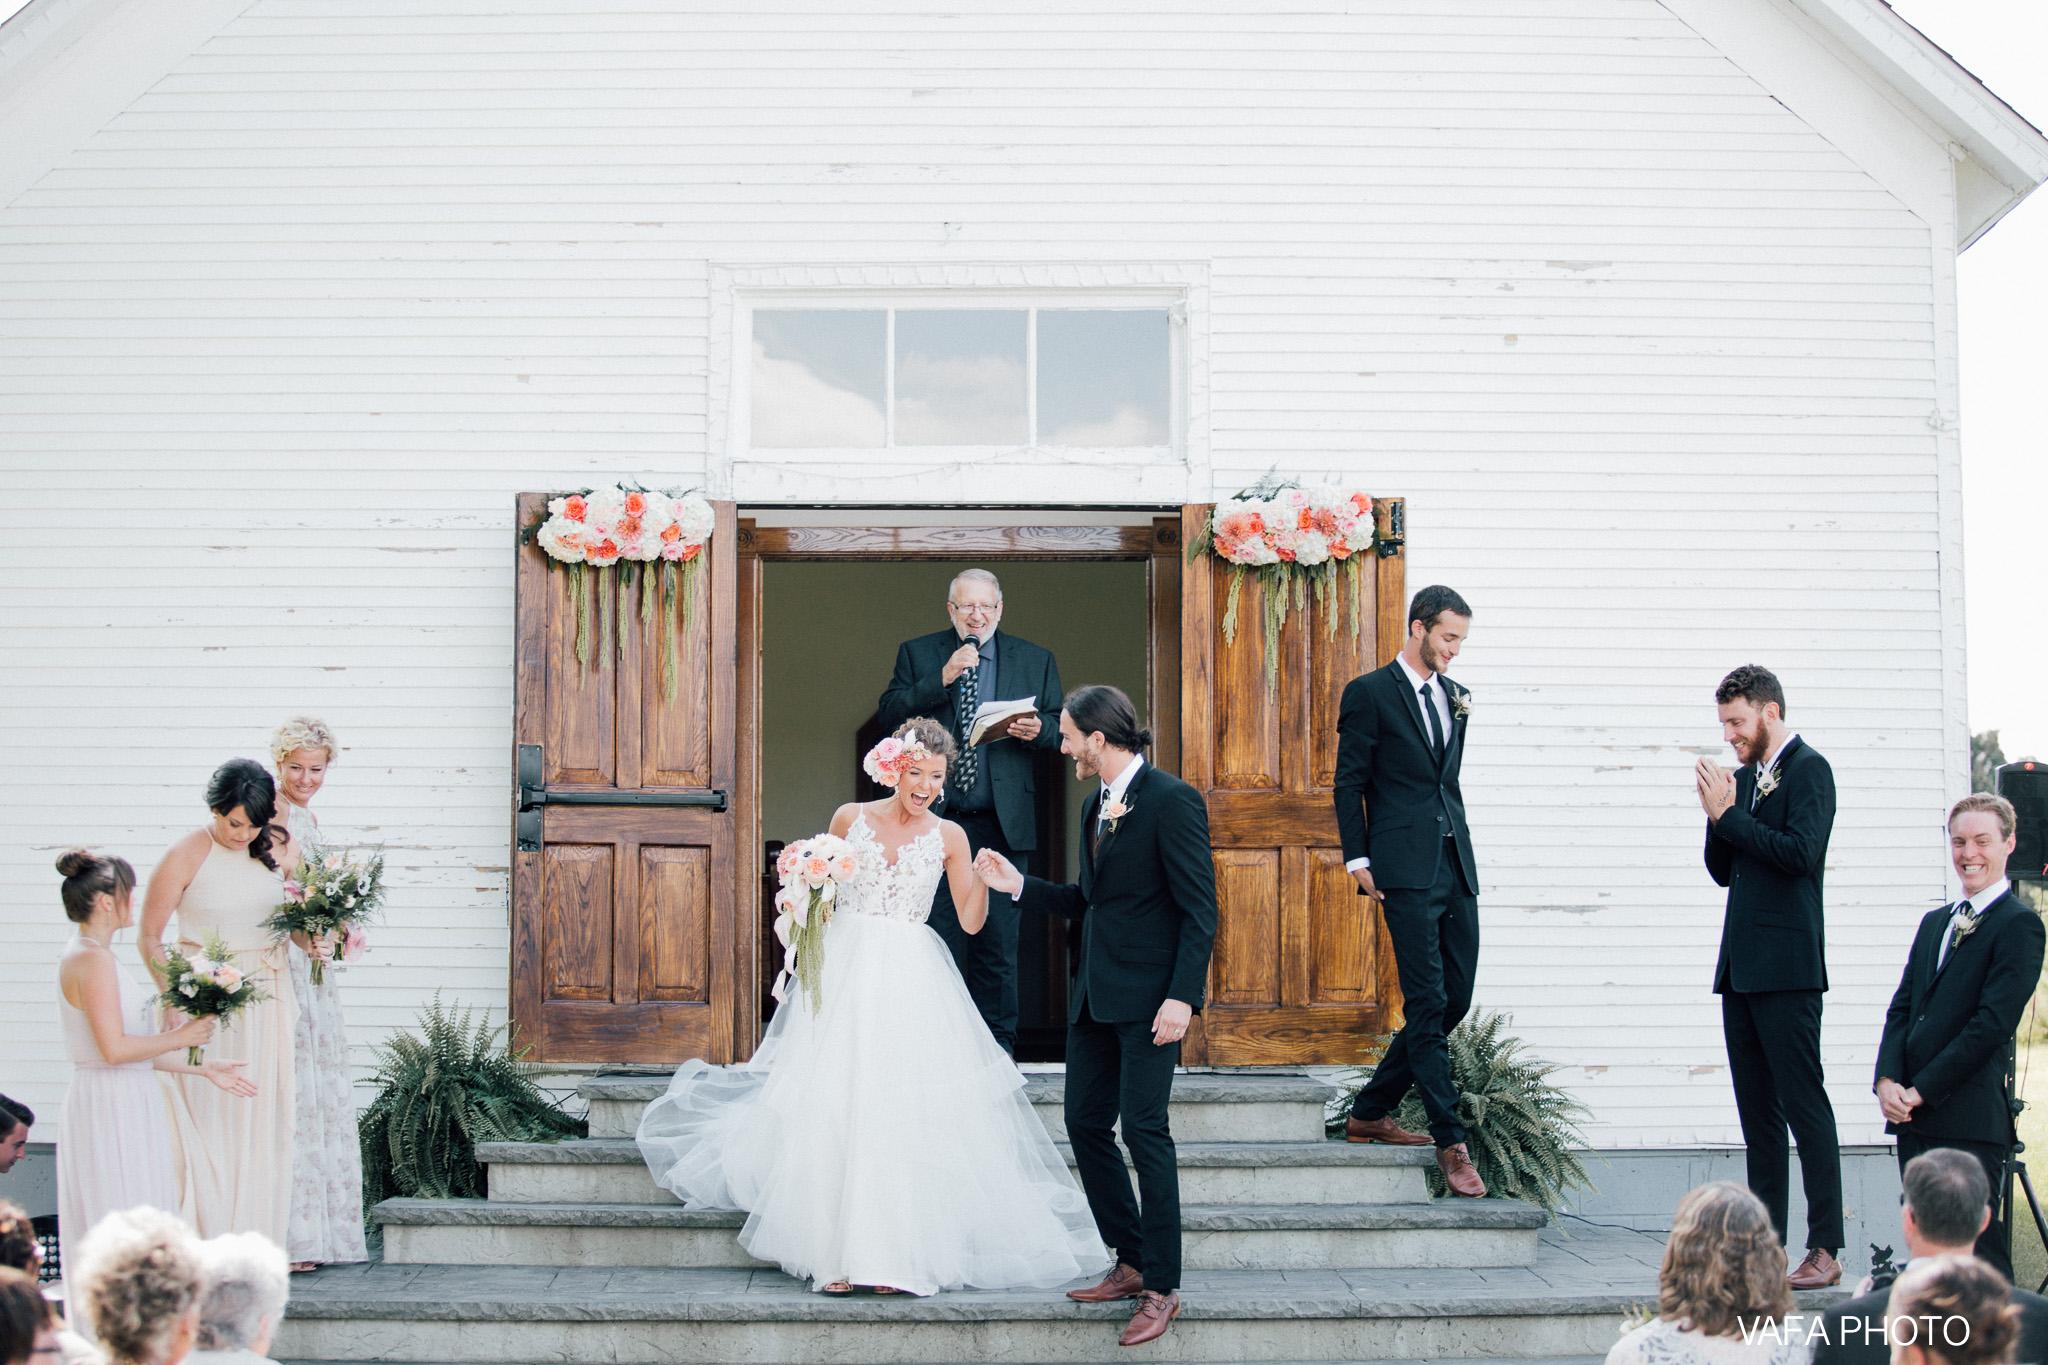 The-Felt-Estate-Wedding-Kailie-David-Vafa-Photo-387.jpg